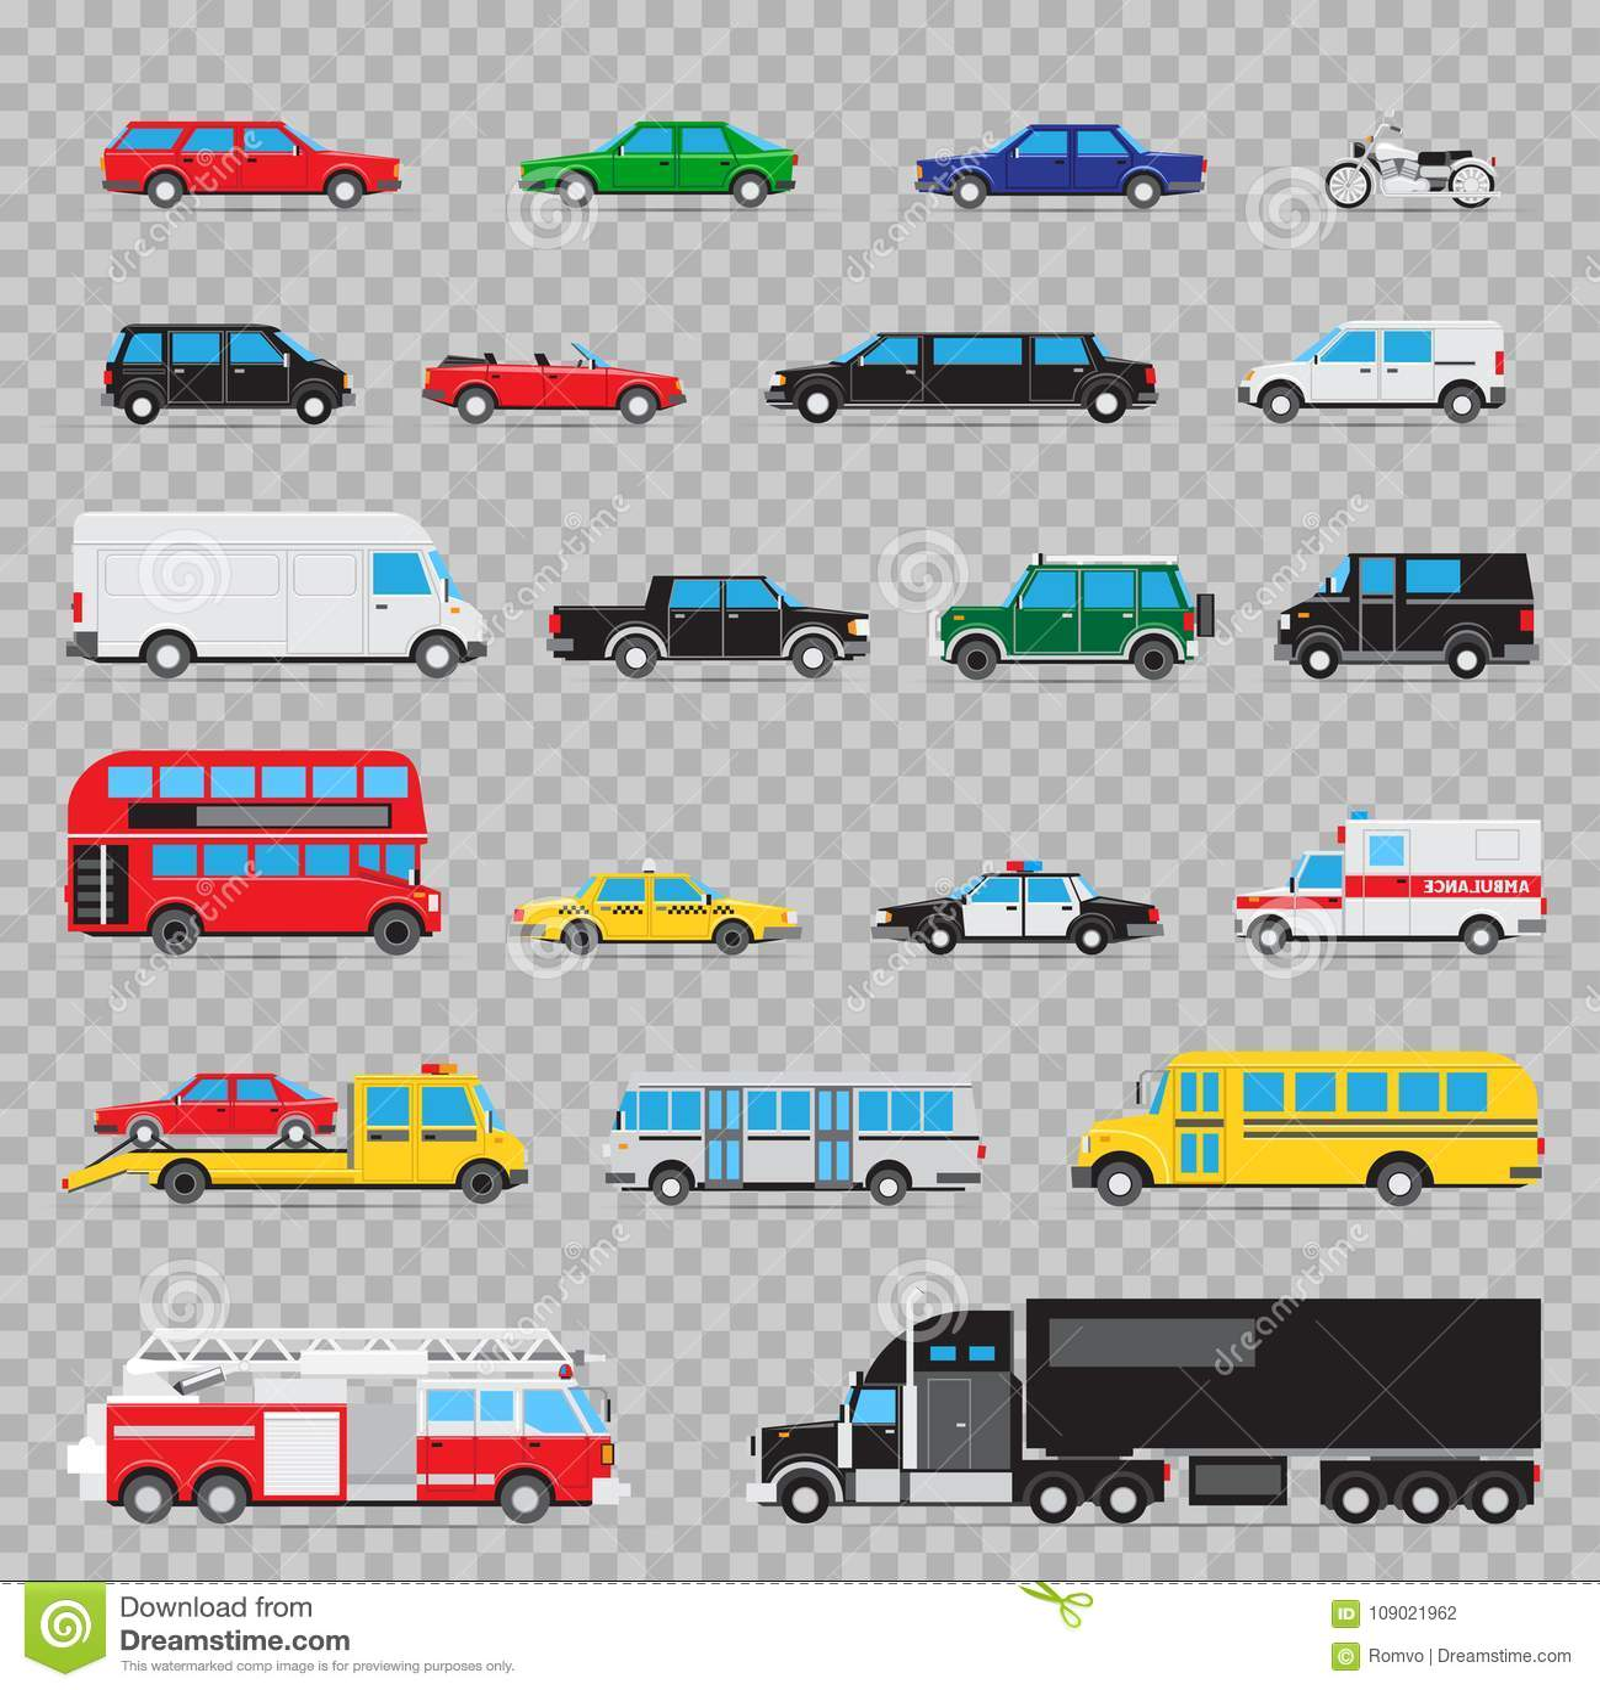 Auto Transport Icon Set Stock Vector. Illustration Of